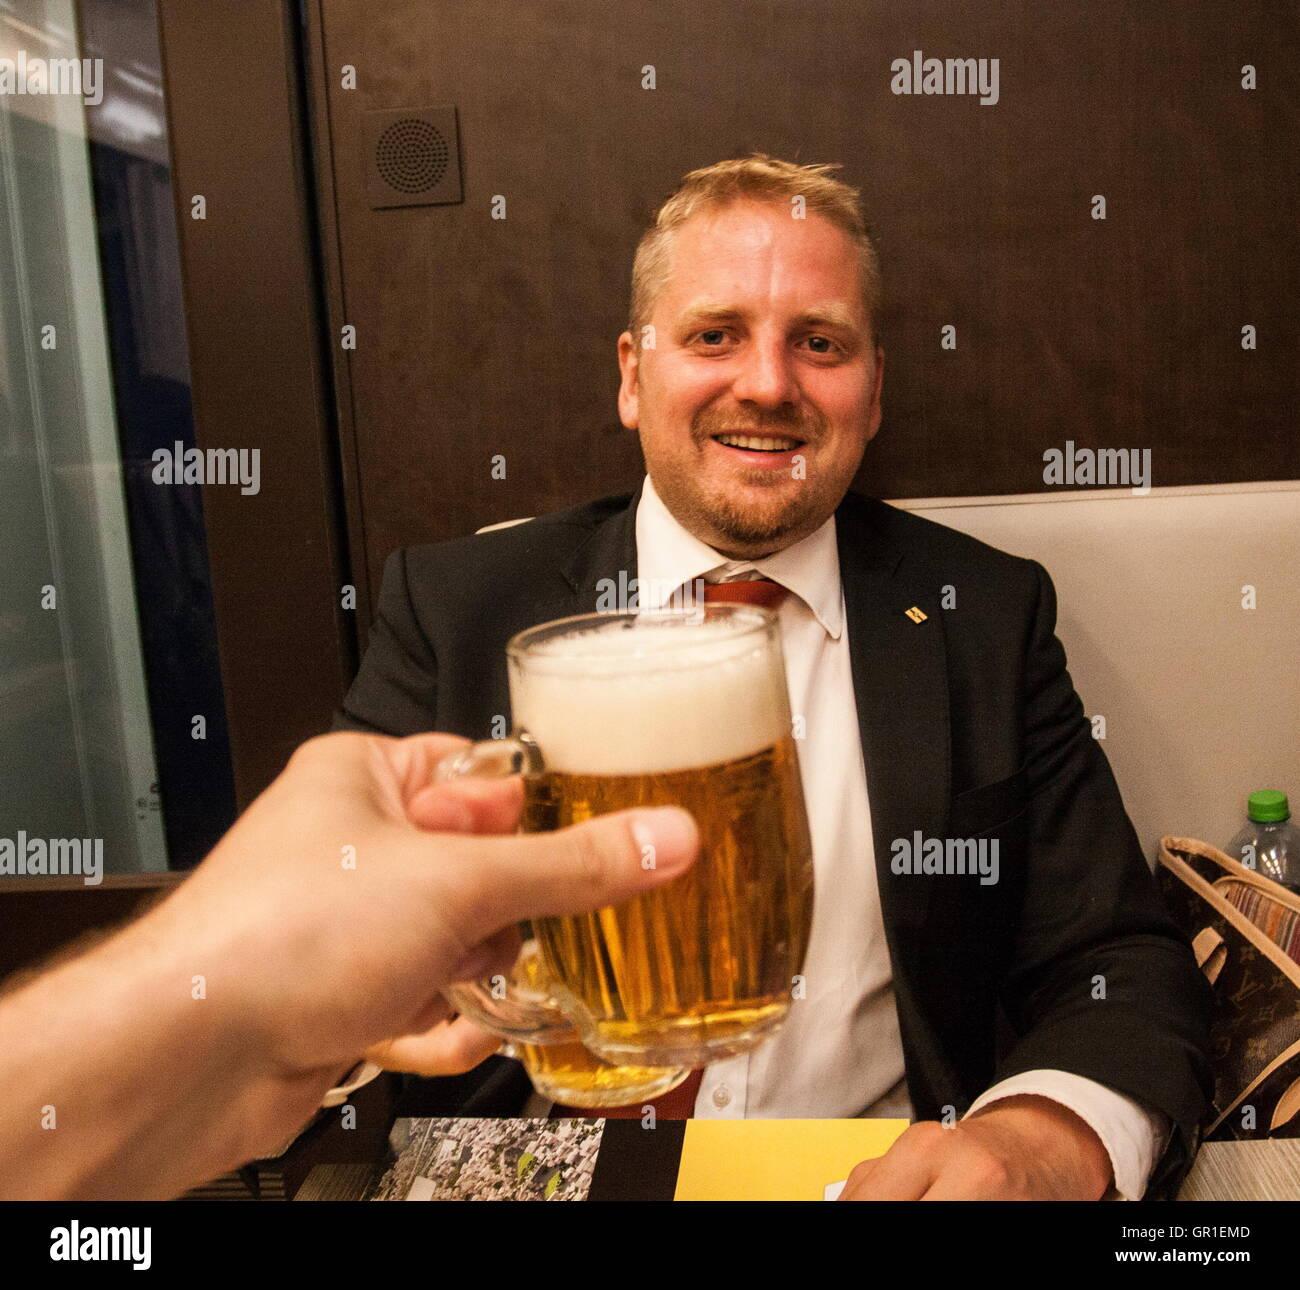 Aug 29, 2016 - Novi Sad, Serbia - Clicking beer glasses with Liberland President VIT JEDLICKA on a train. The Free - Stock Image